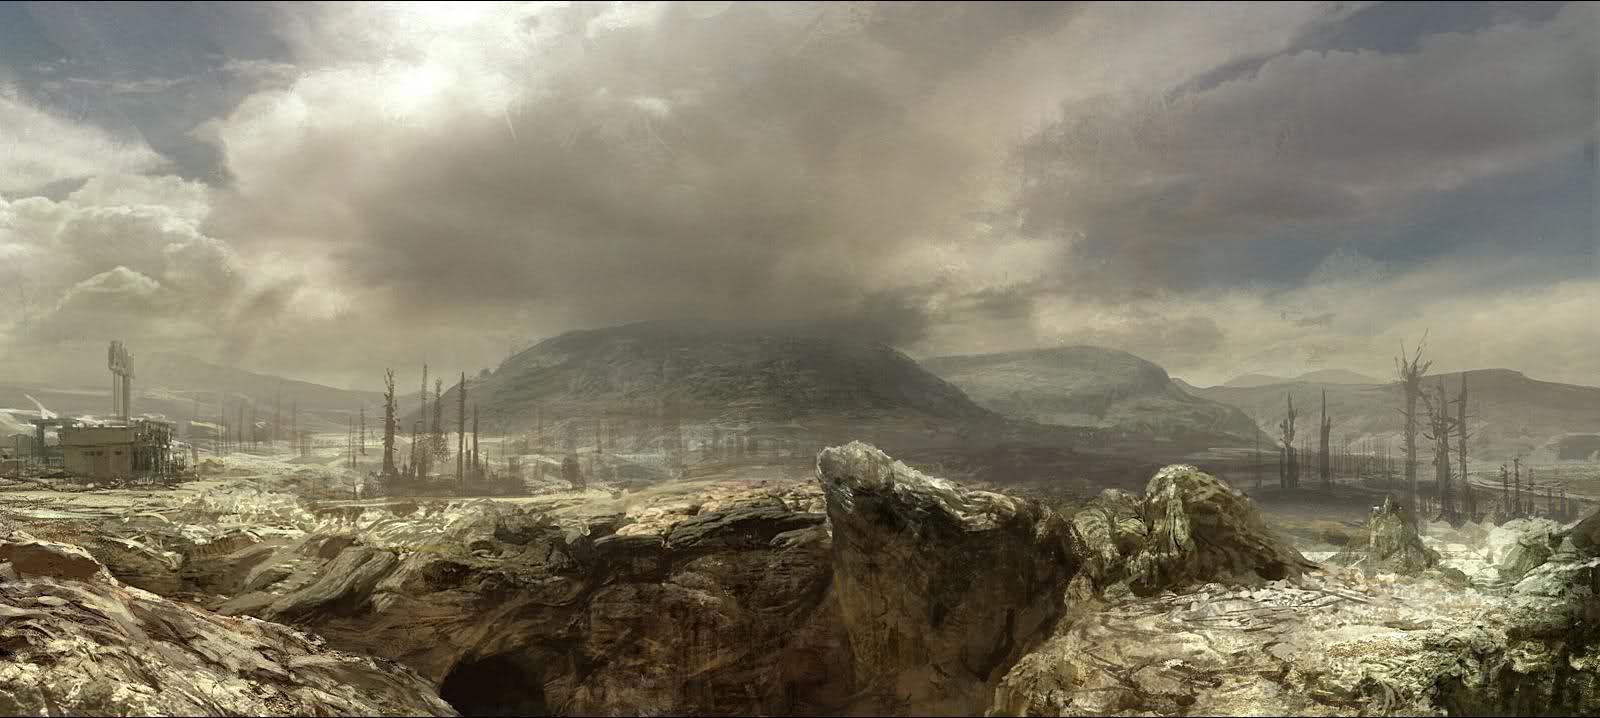 En Fallout 3, ¿Cuál era el Cabezón más difícil de encontrar?